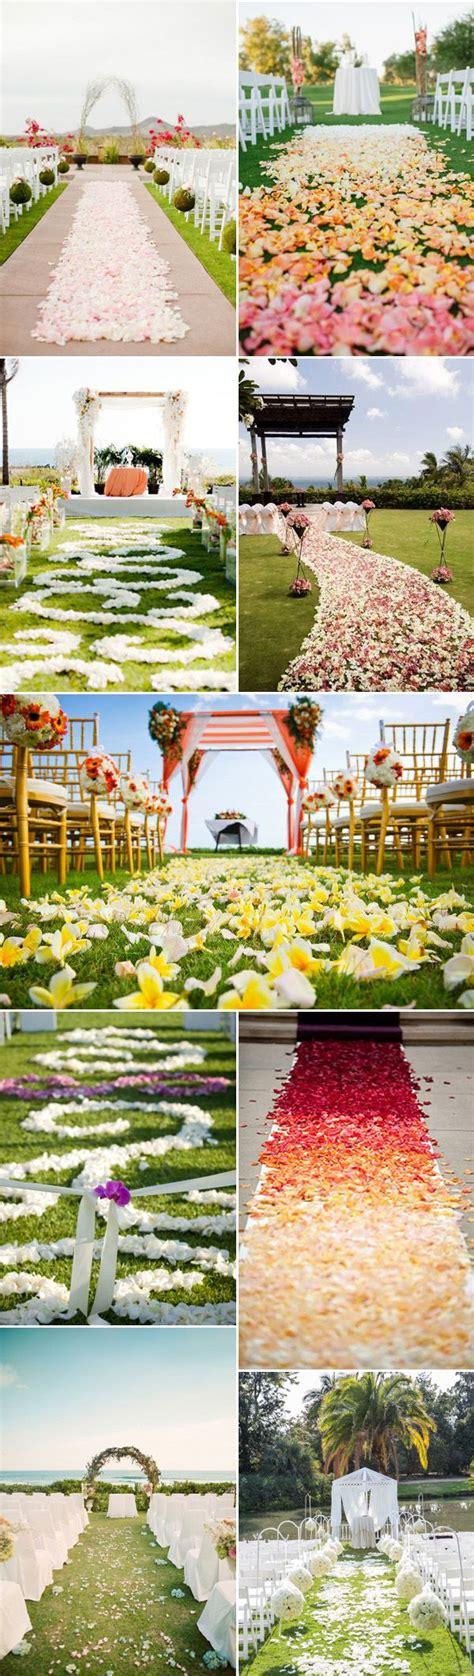 Outdoor Wedding Aisle Runner Ideas by Best 25 Outdoor Wedding Aisles Ideas On